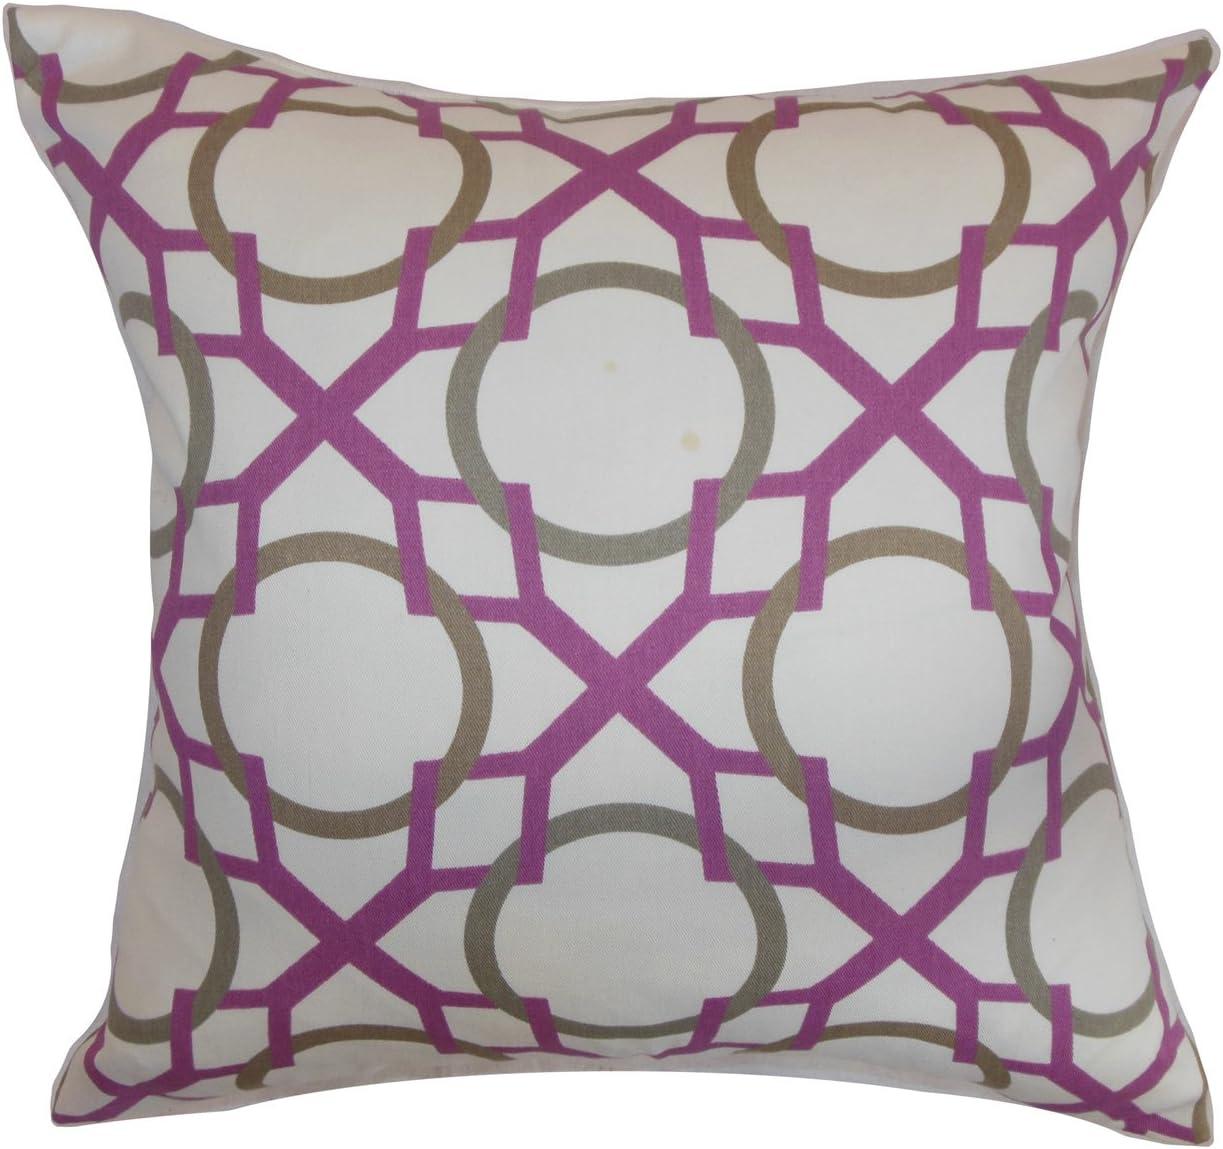 The Pillow Collection Lacbiche Geometric Pillow, Wisteria